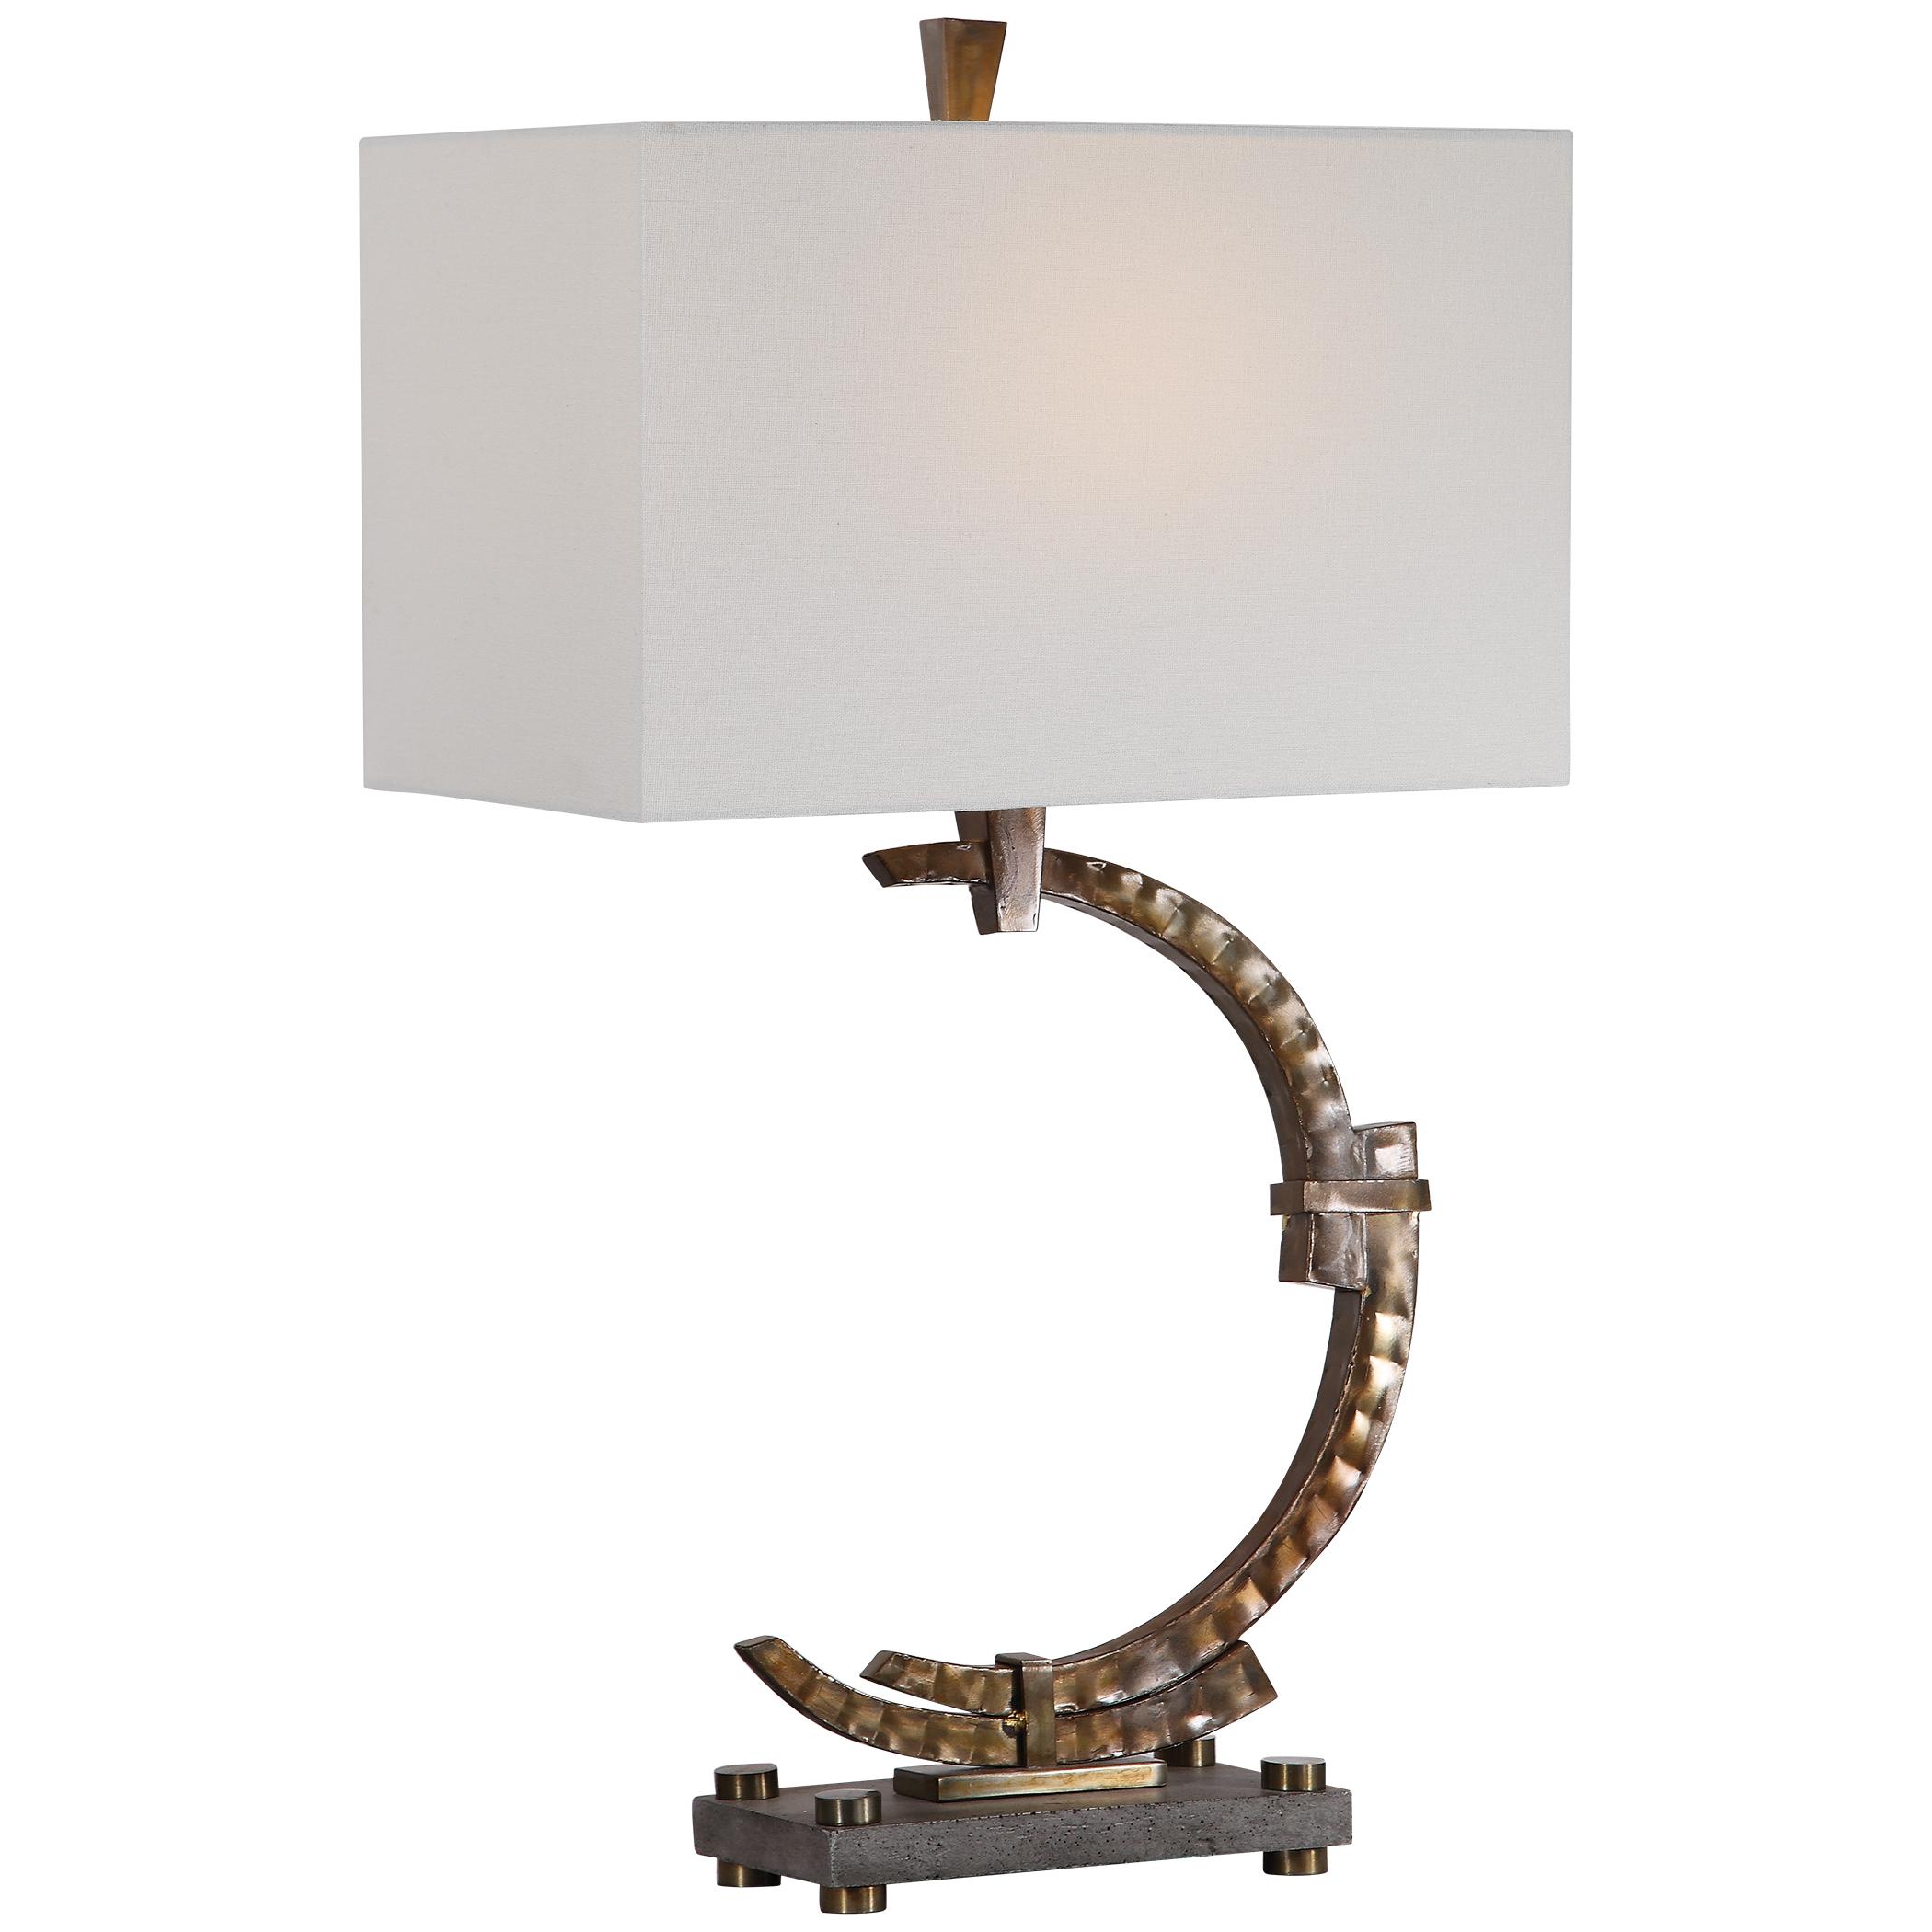 Modern Industrial Hammered Bronze Metal Table Lamp ...